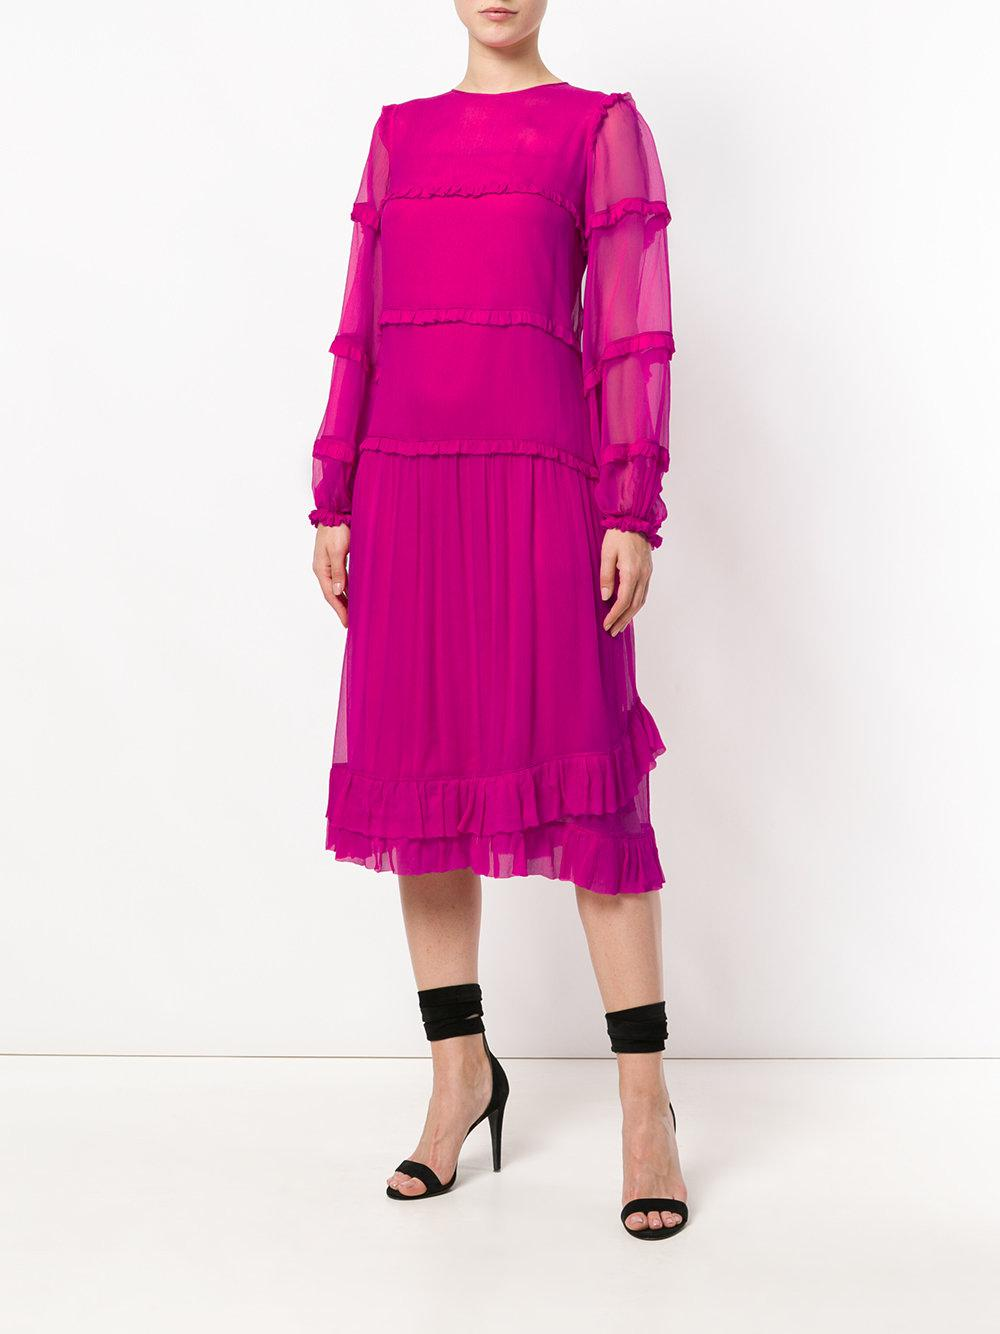 The Cheapest Cheap Price shift midi dress - Pink & Purple N°21 Cheapest For Sale SbMicJ4